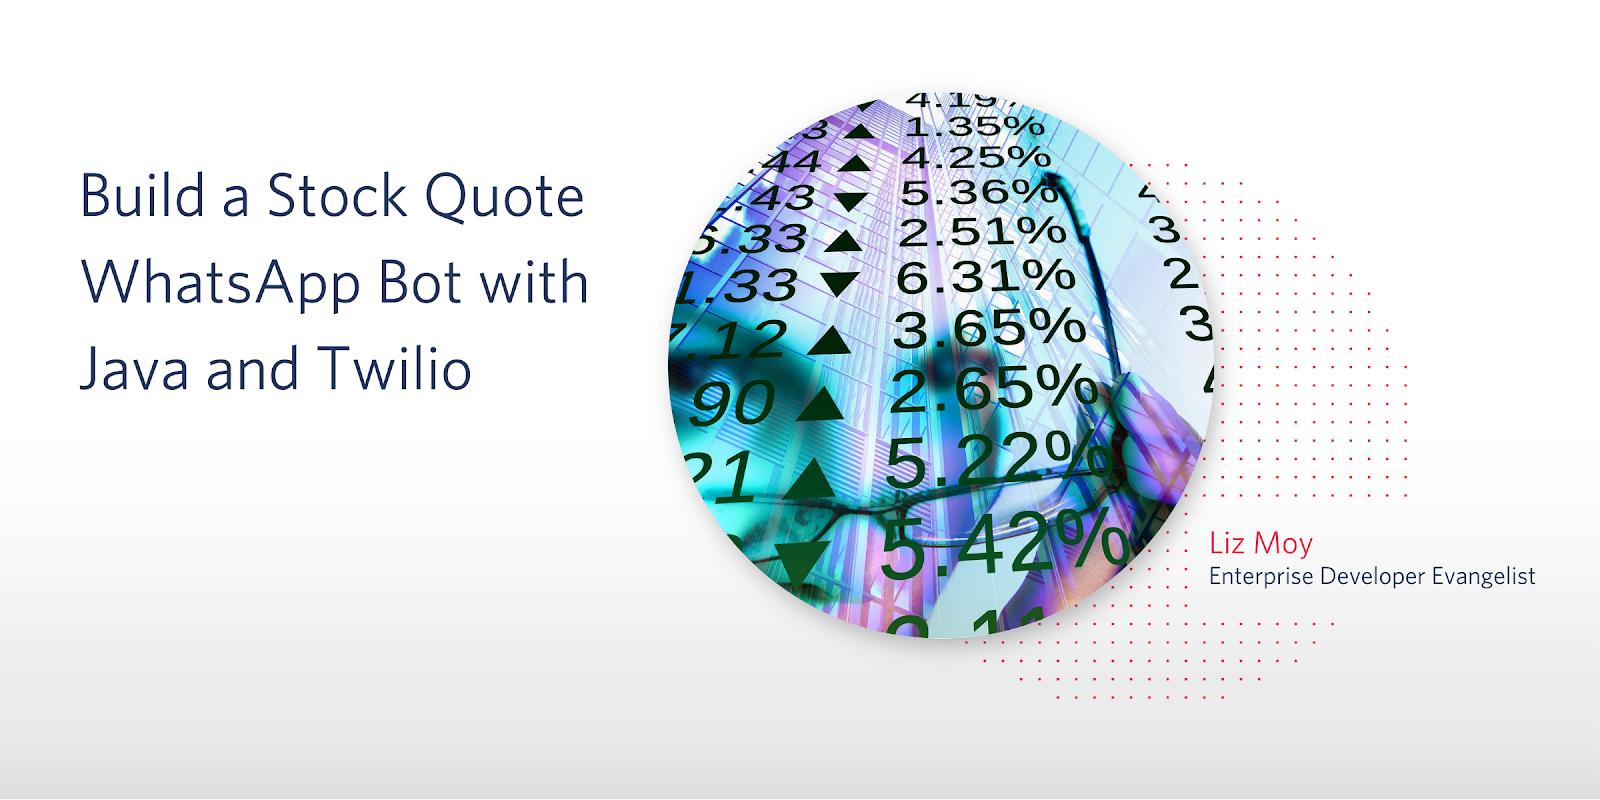 Build a Stock Quote WhatsApp Bot with Java and Twilio - Twilio